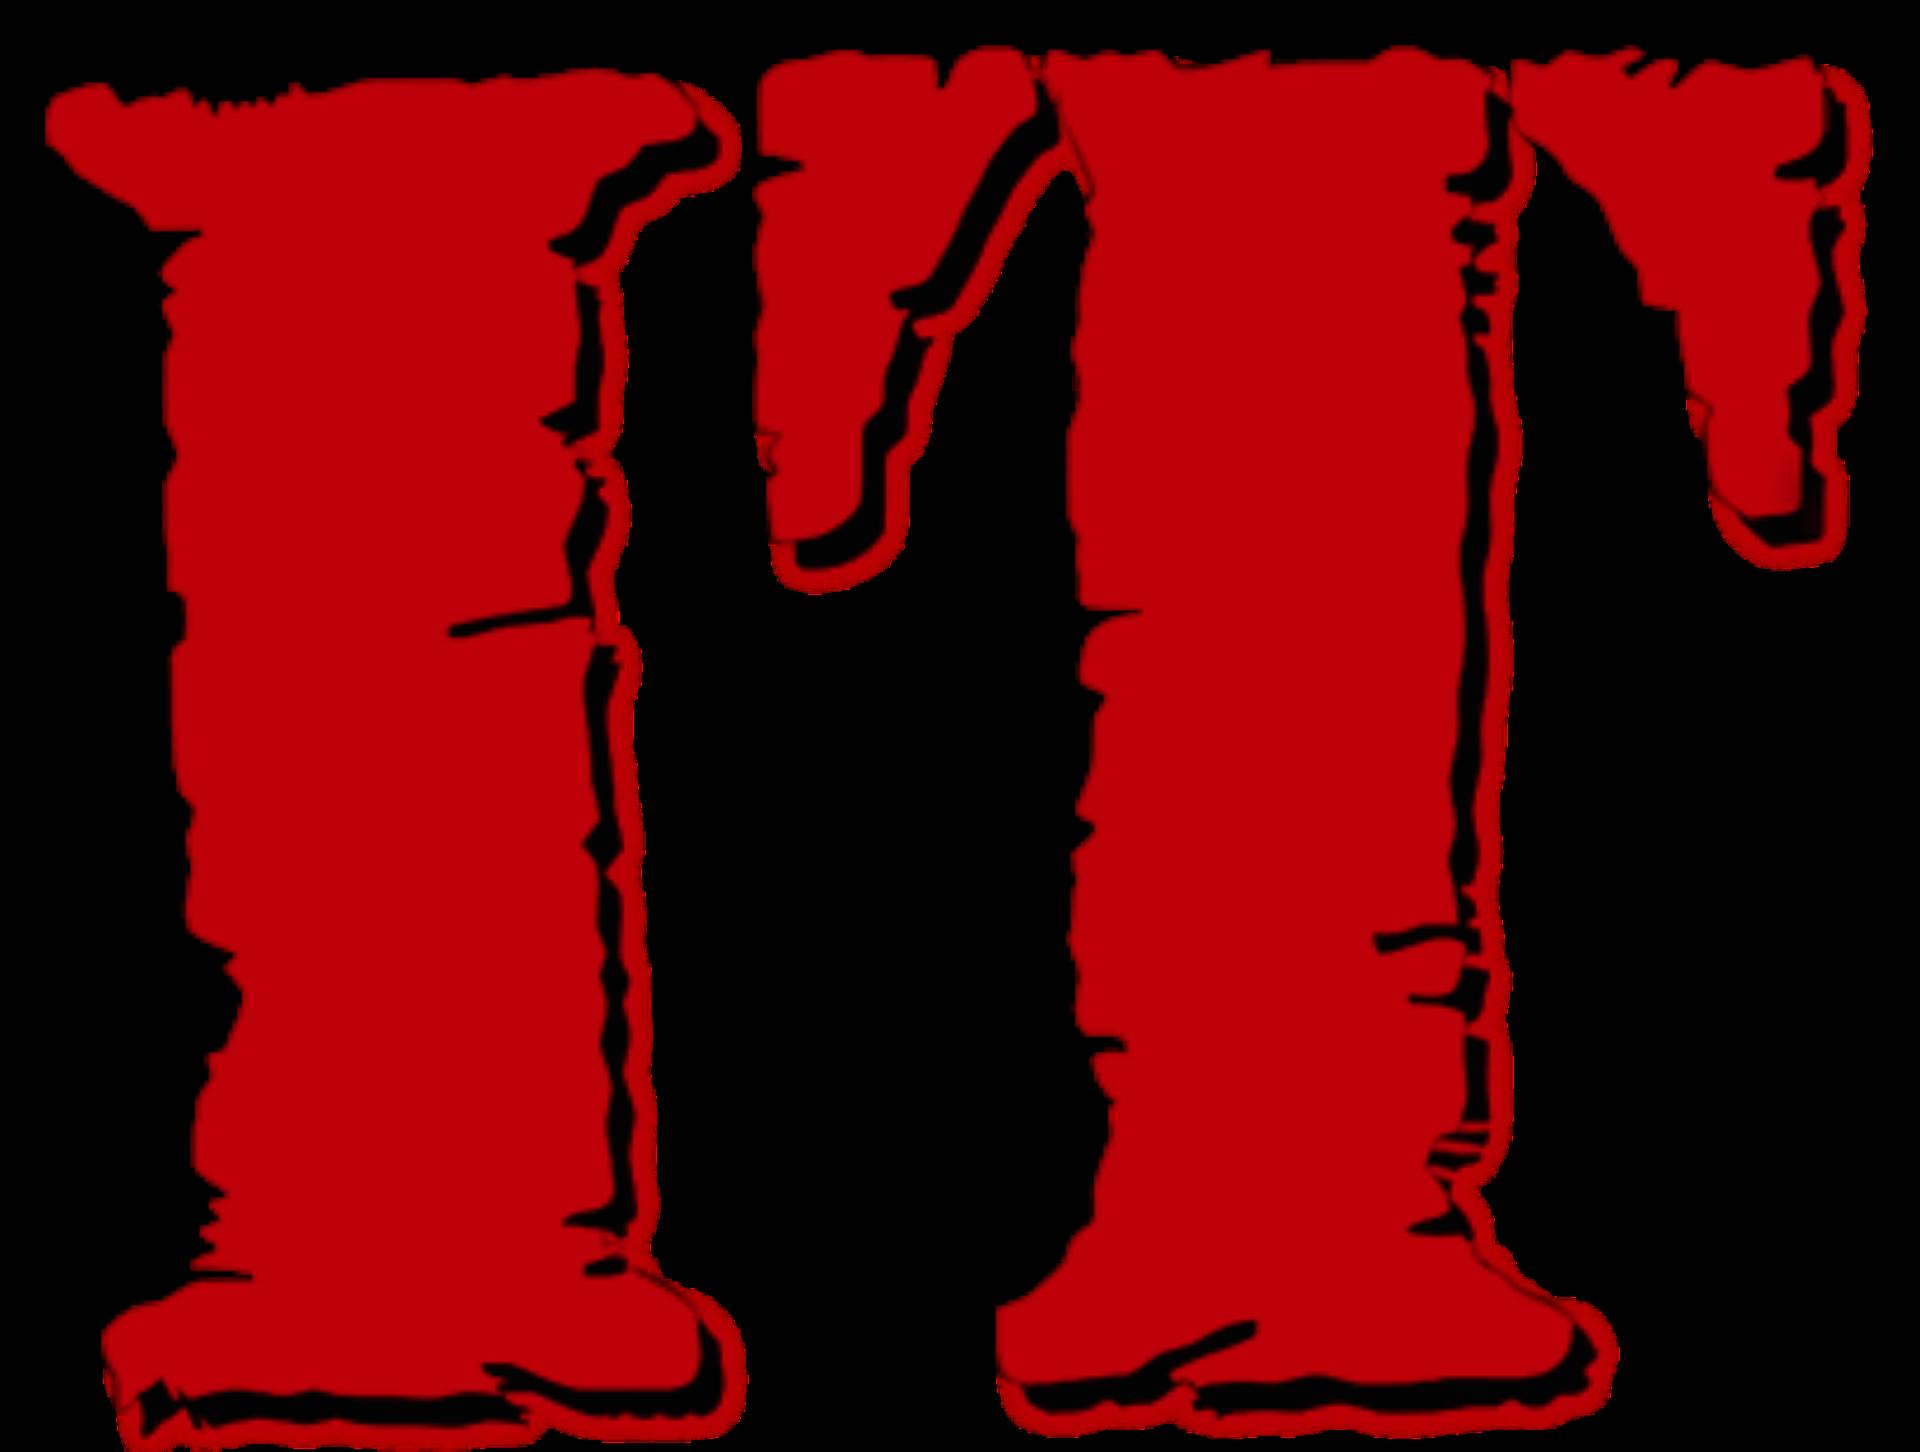 File:IT (1990) logo.png.